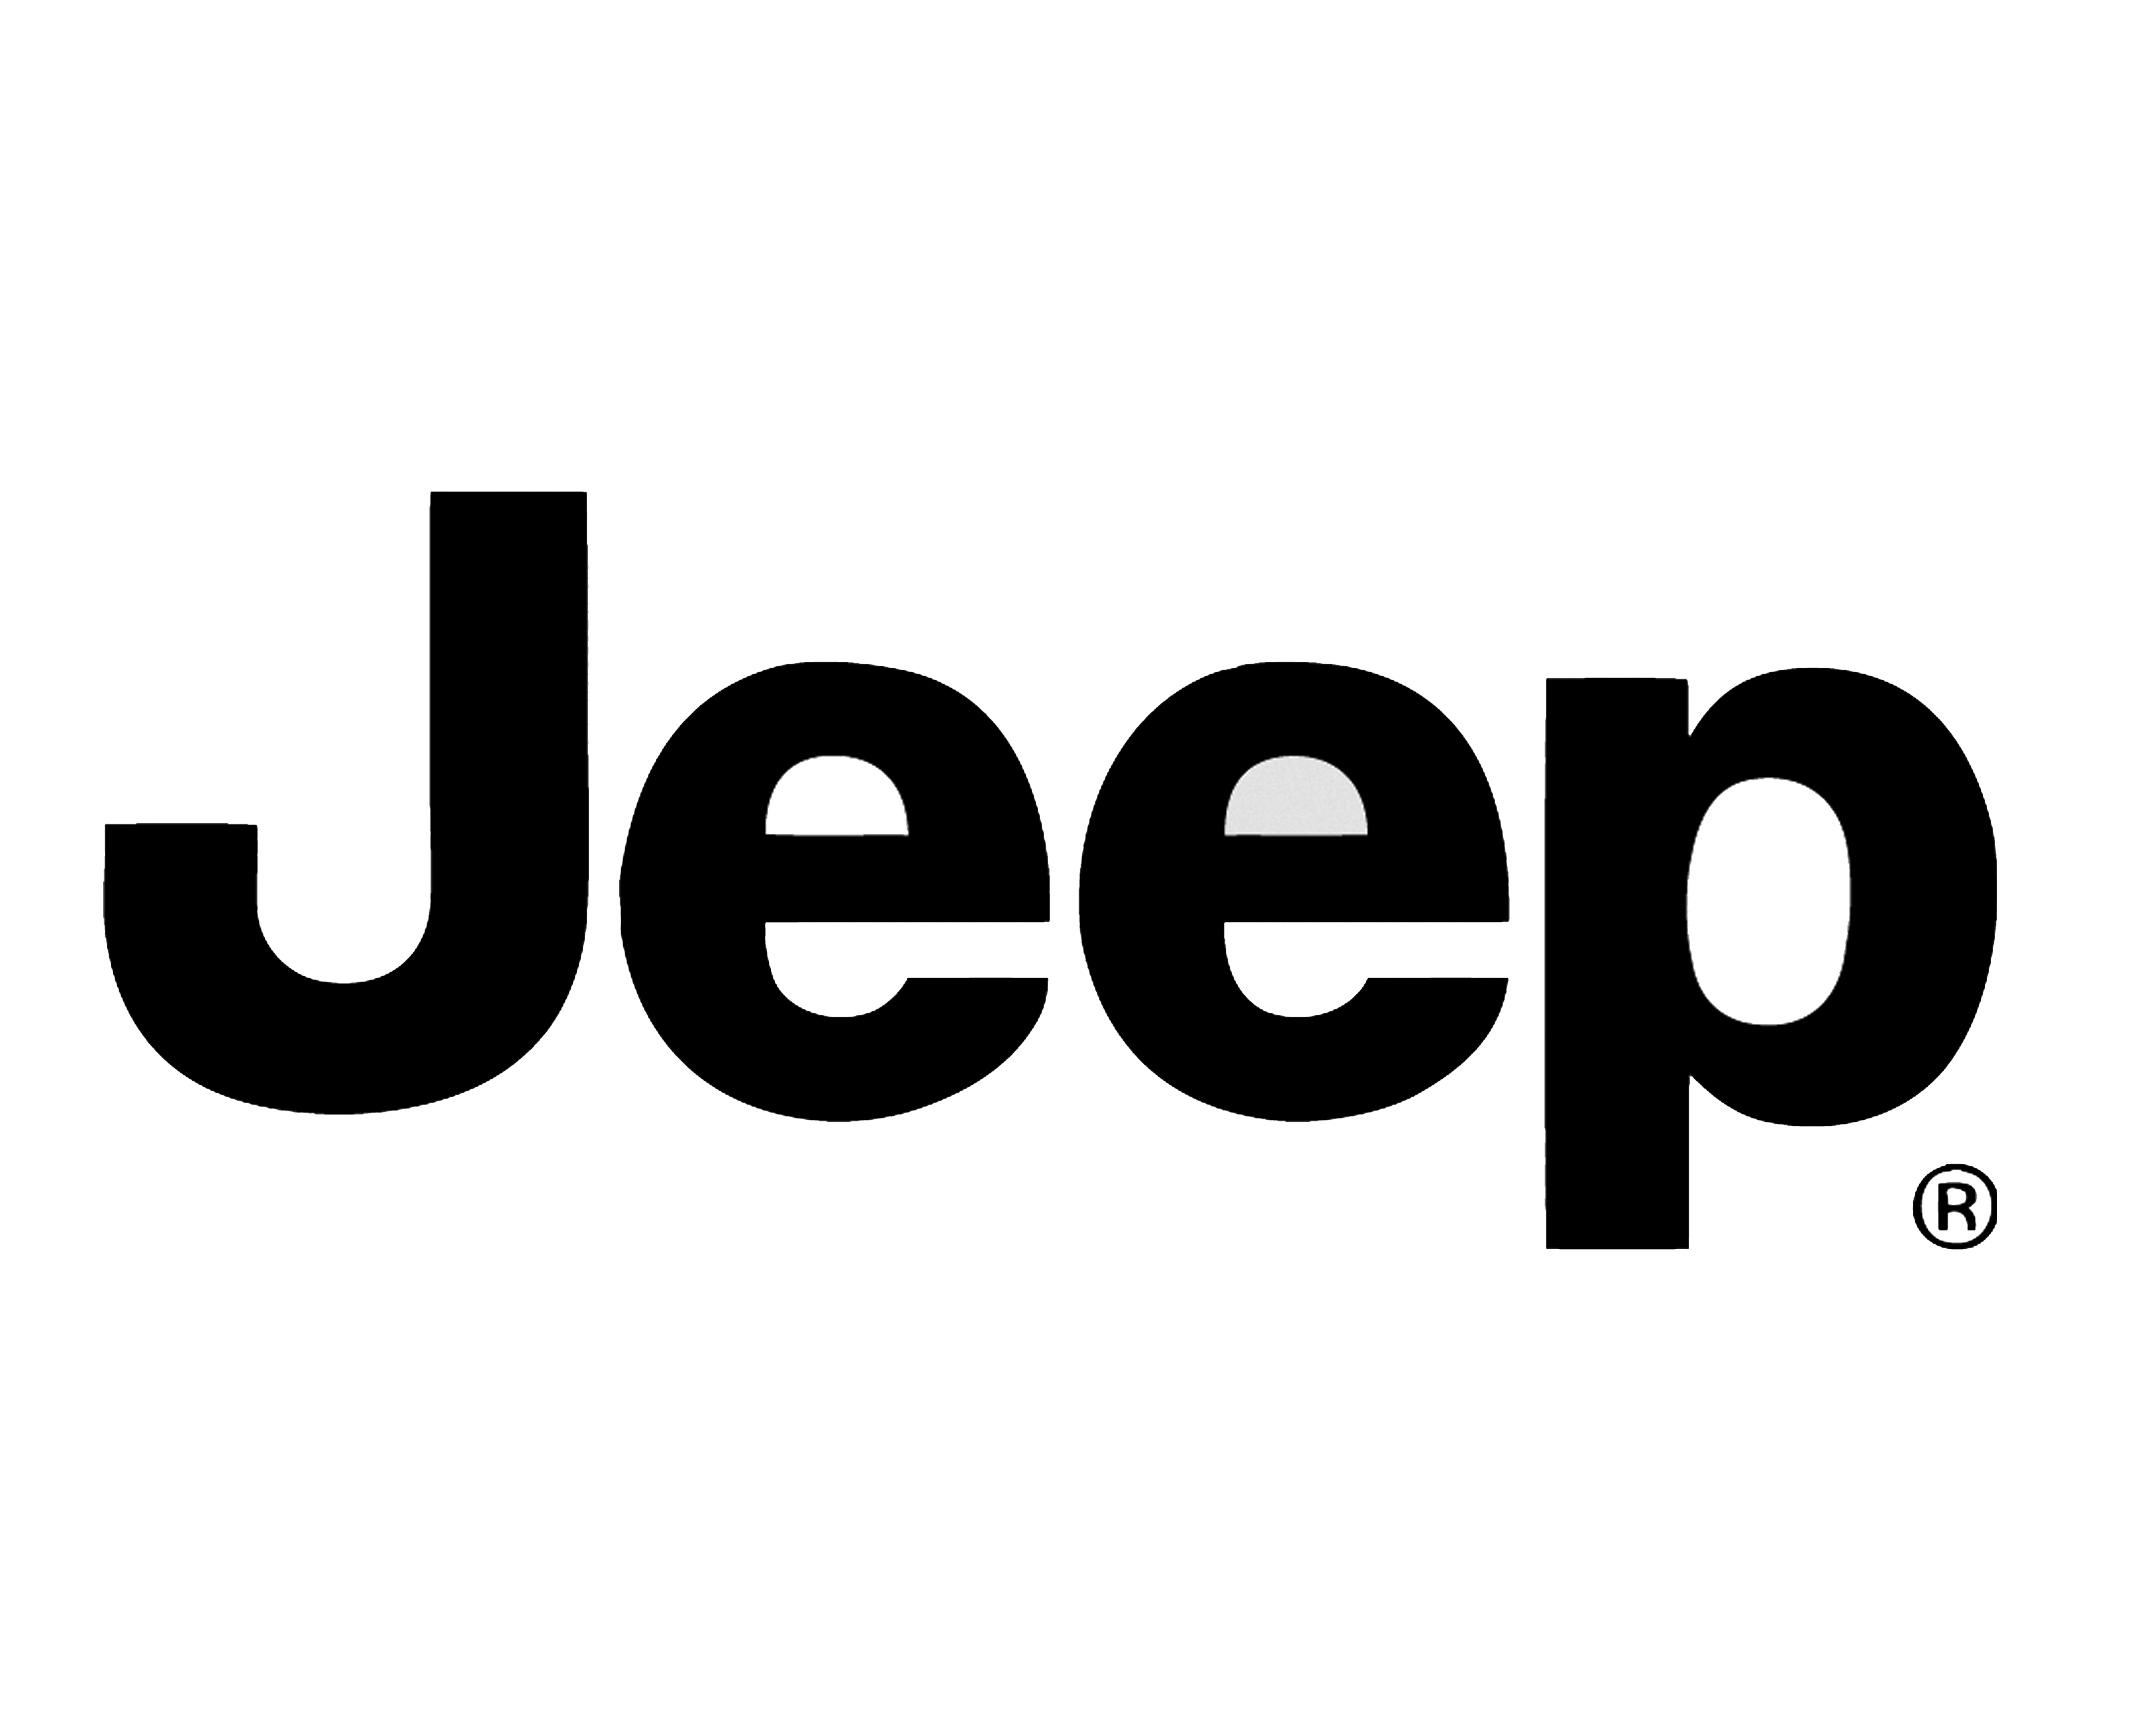 jeep-trucks-logo-emblem.jpg